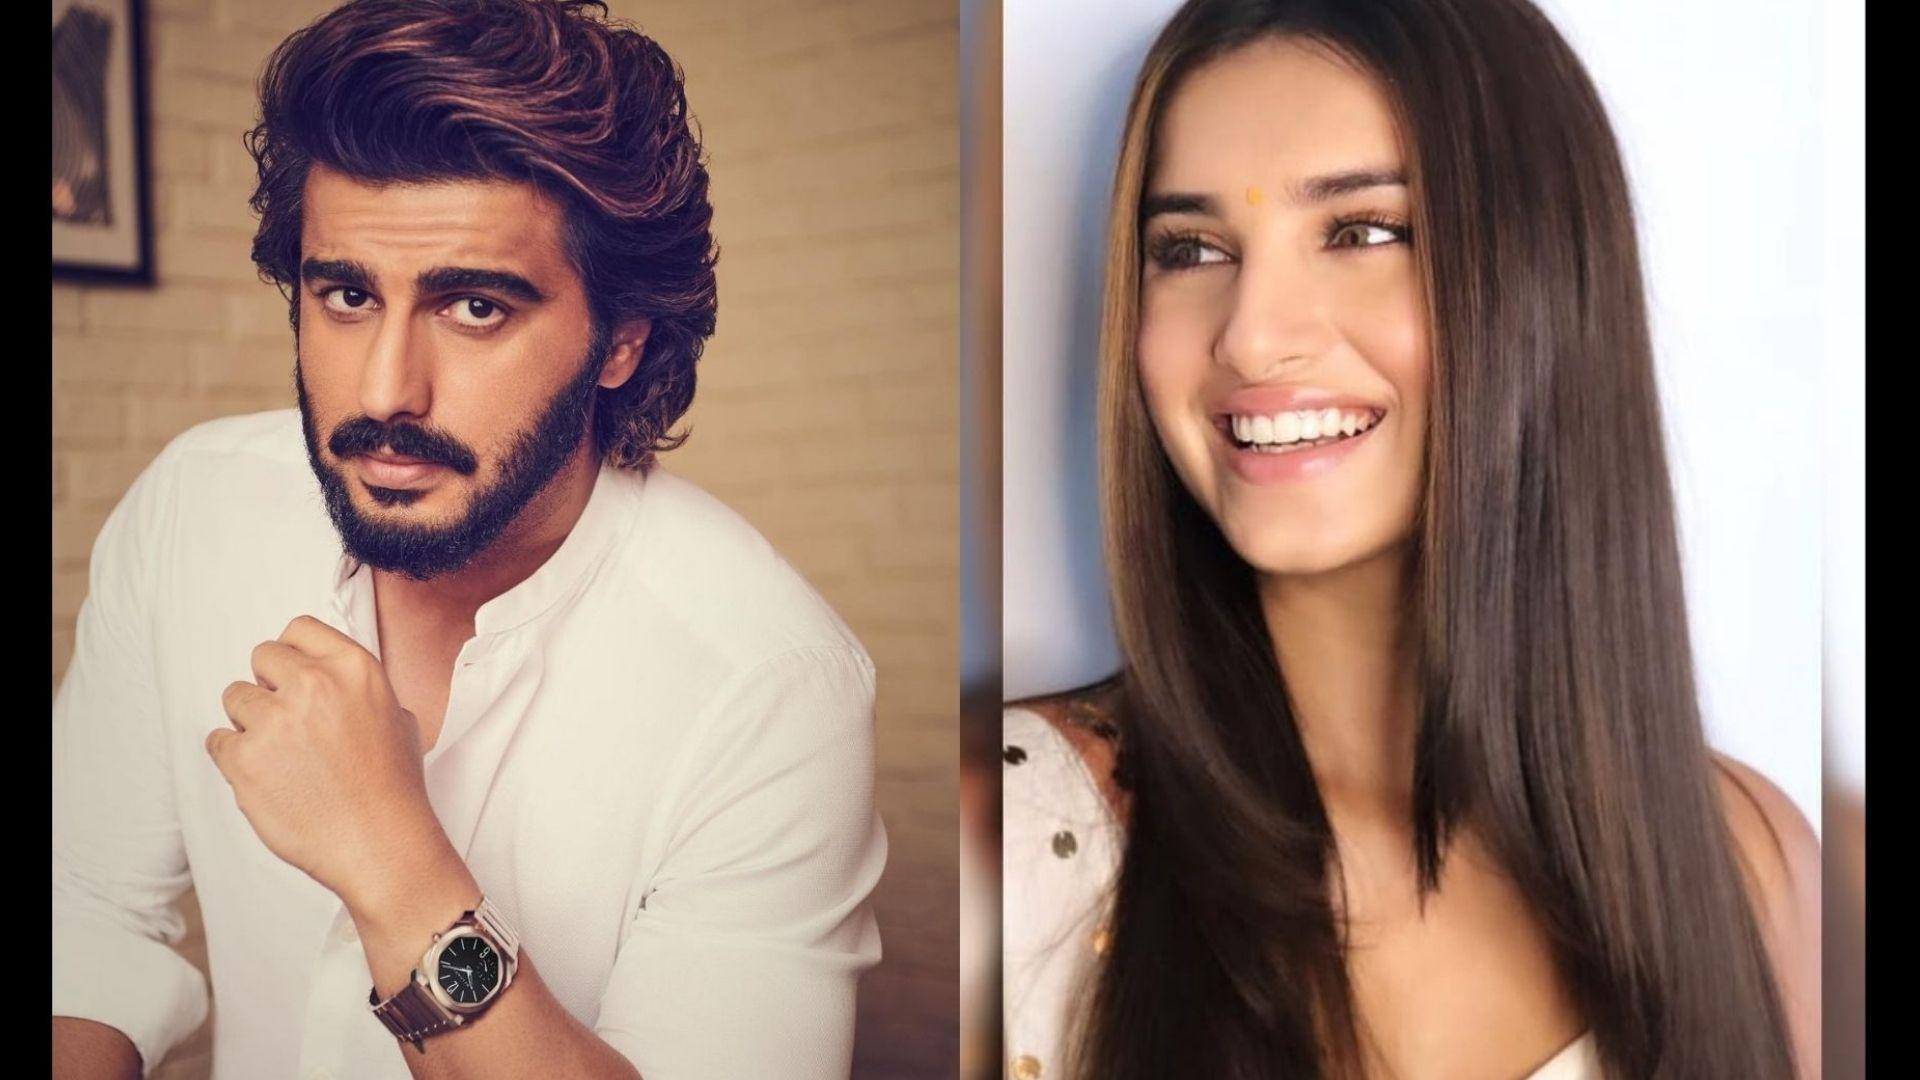 Ek Villain Returns: Arjun Kapoor And Tara Sutraia Snapped Together At The Jetty Heading For A Randevu